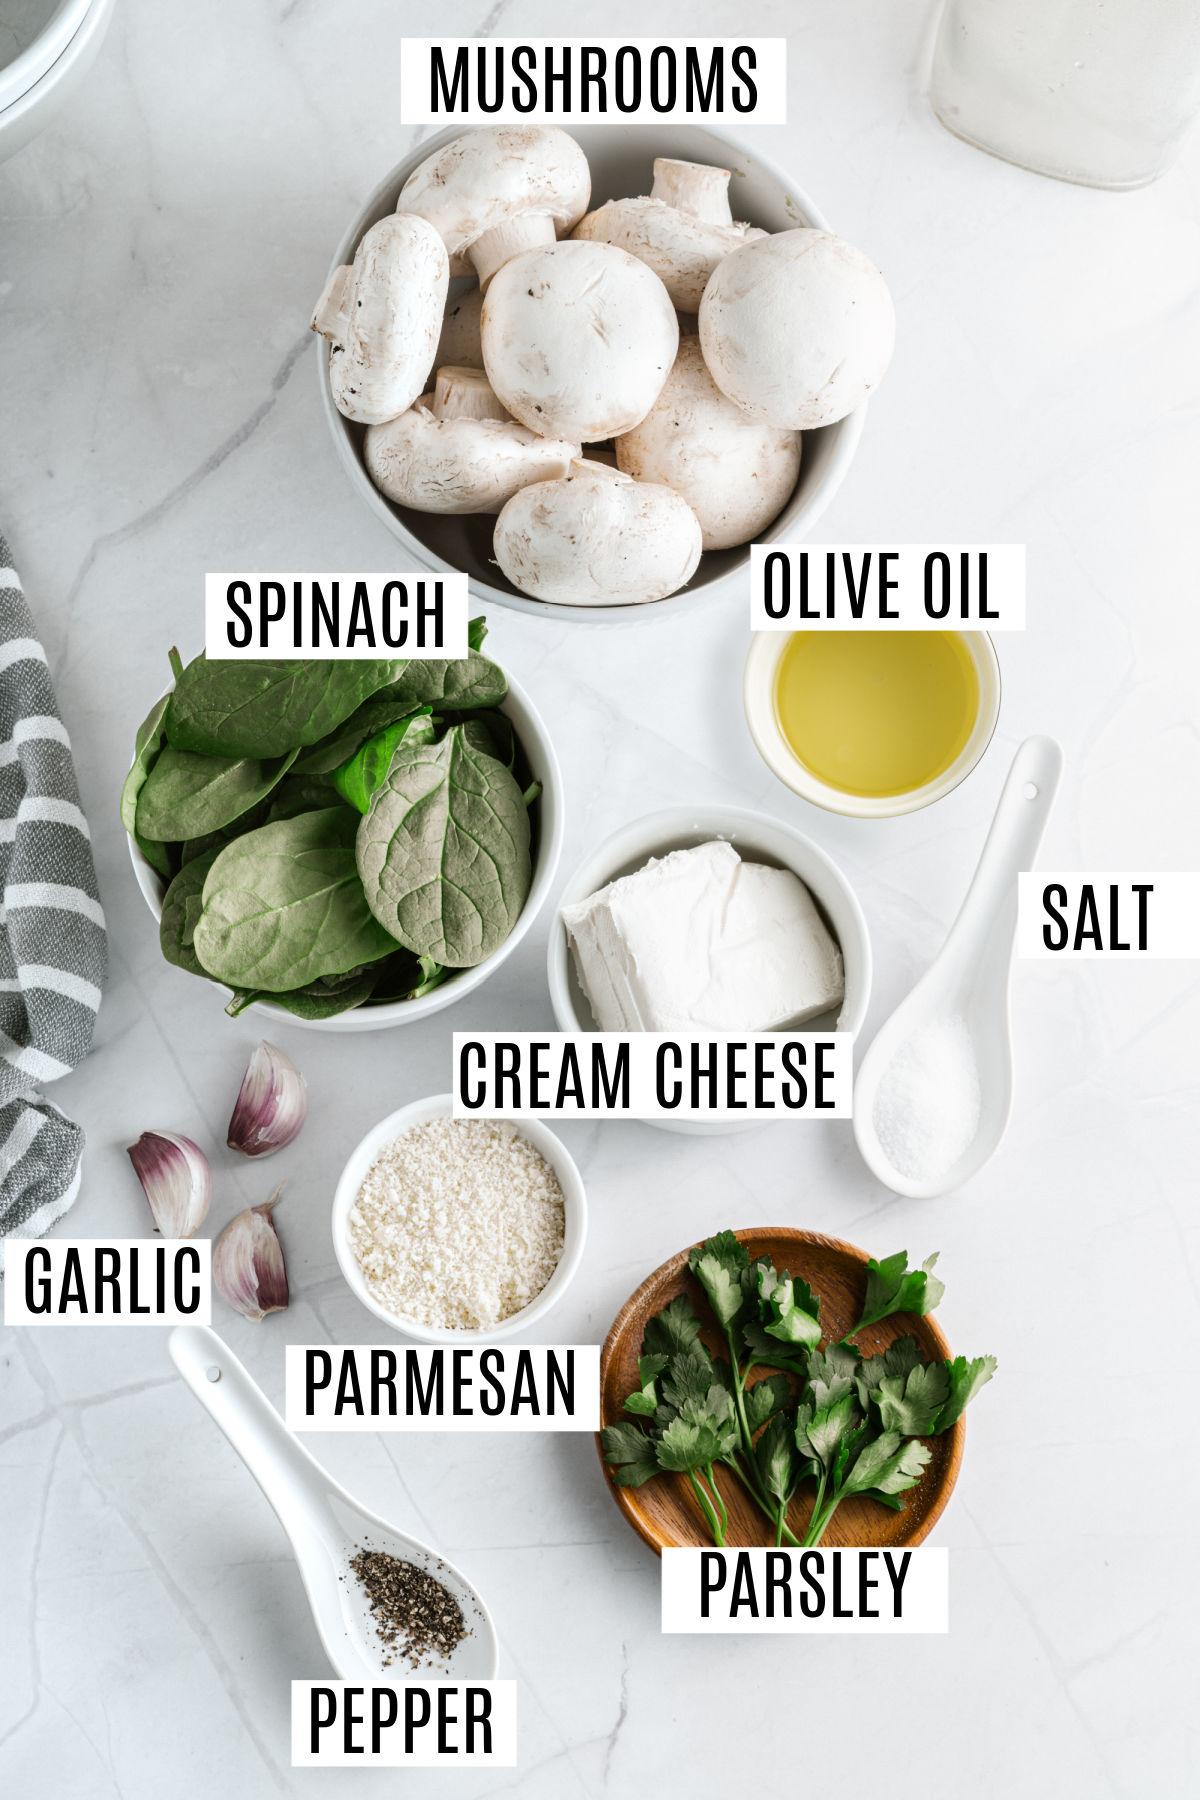 Ingredients needed for gluten free stuffed mushrooms.